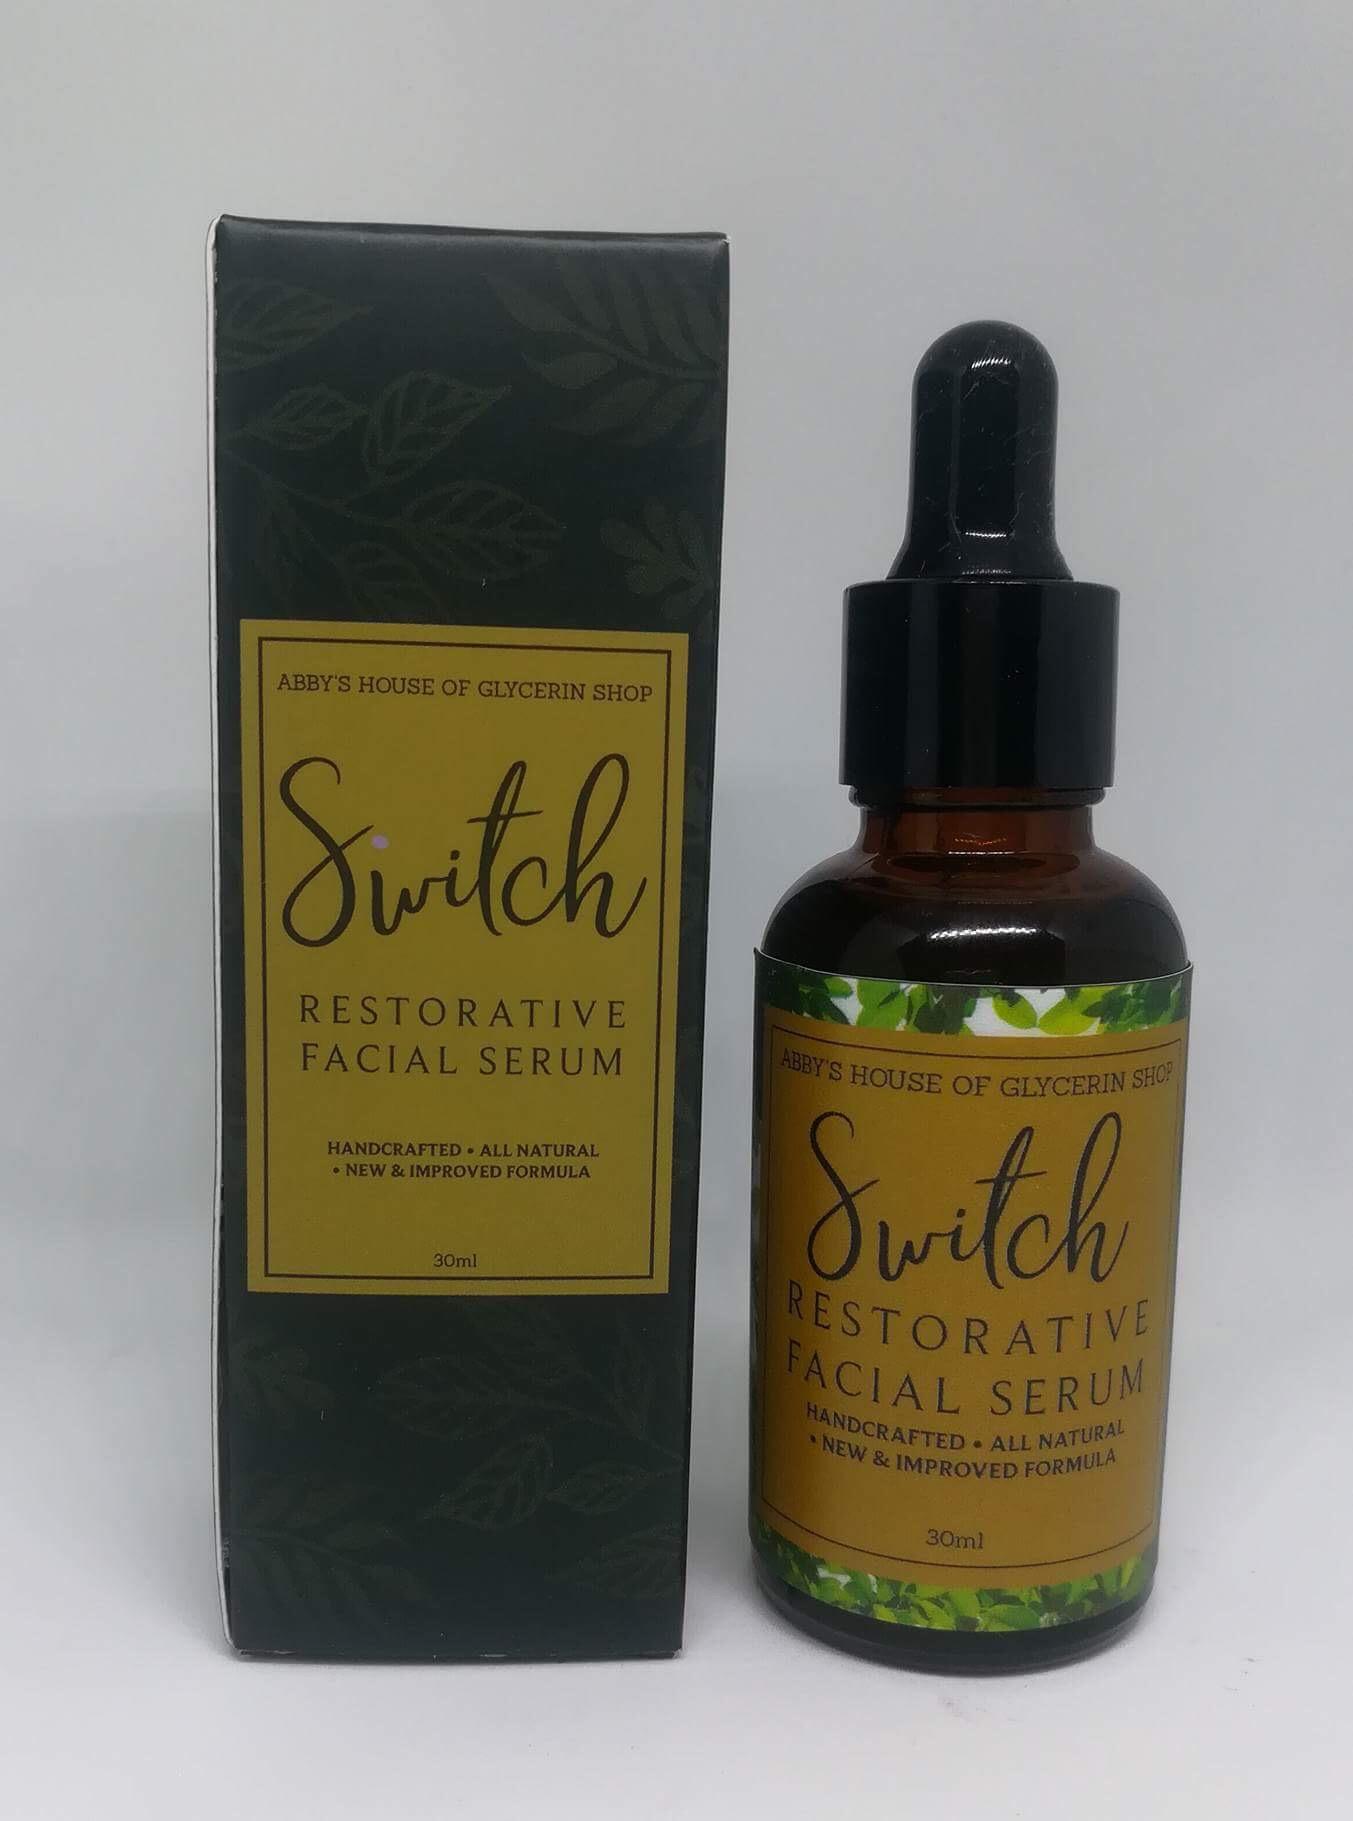 Price Review Glukocenta Facial Foam Gold Glowing Serum Philippines Switch Restorative 30ml